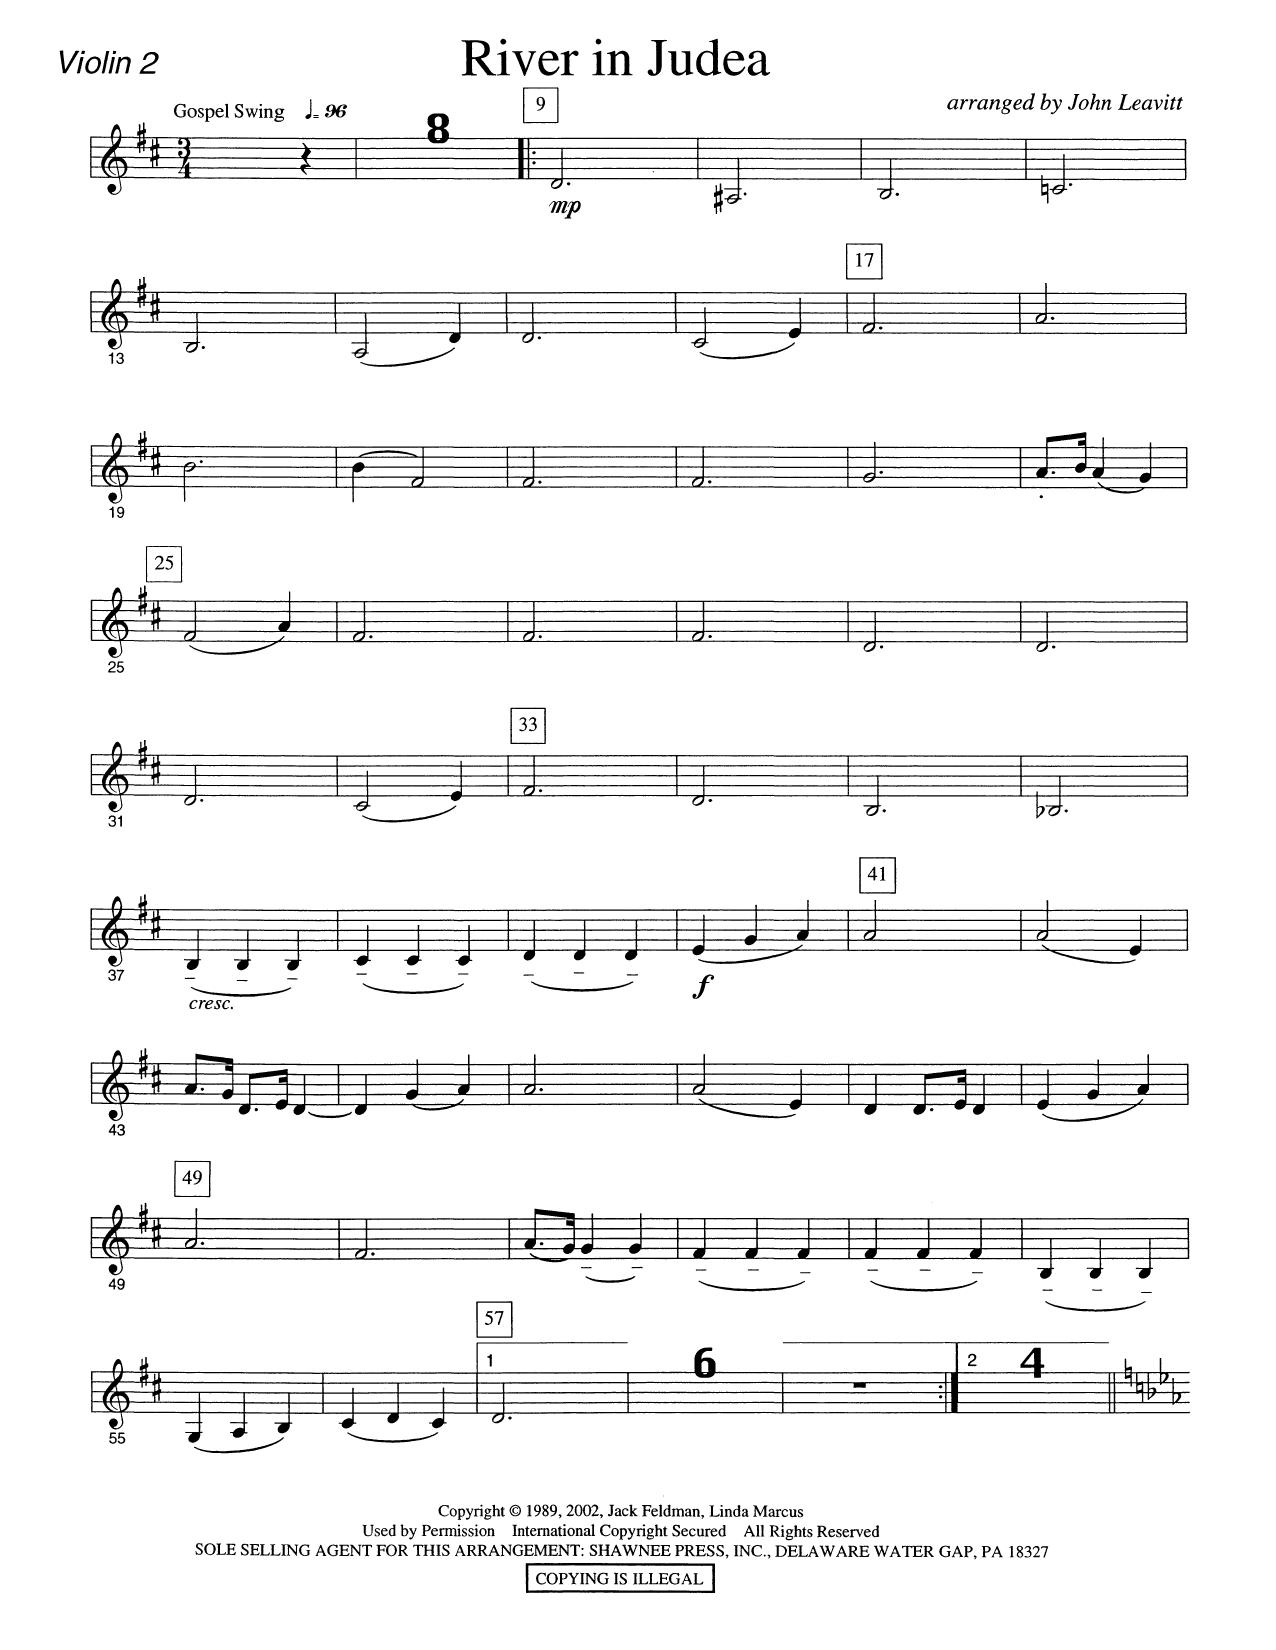 River in Judea - Violin 2 Sheet Music